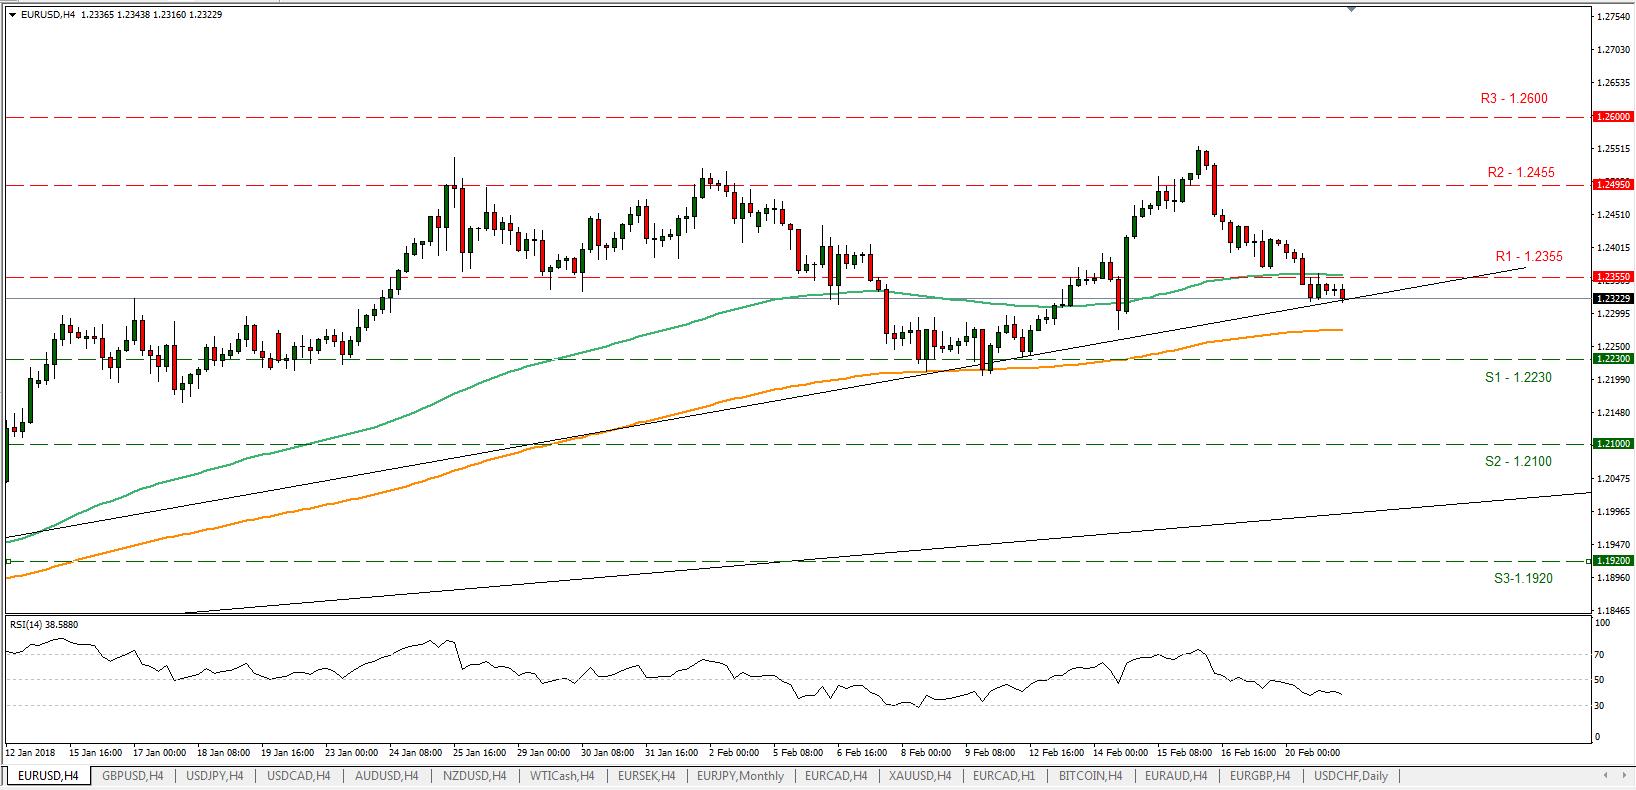 EUR/USD 21/02/2018 | EconAlerts